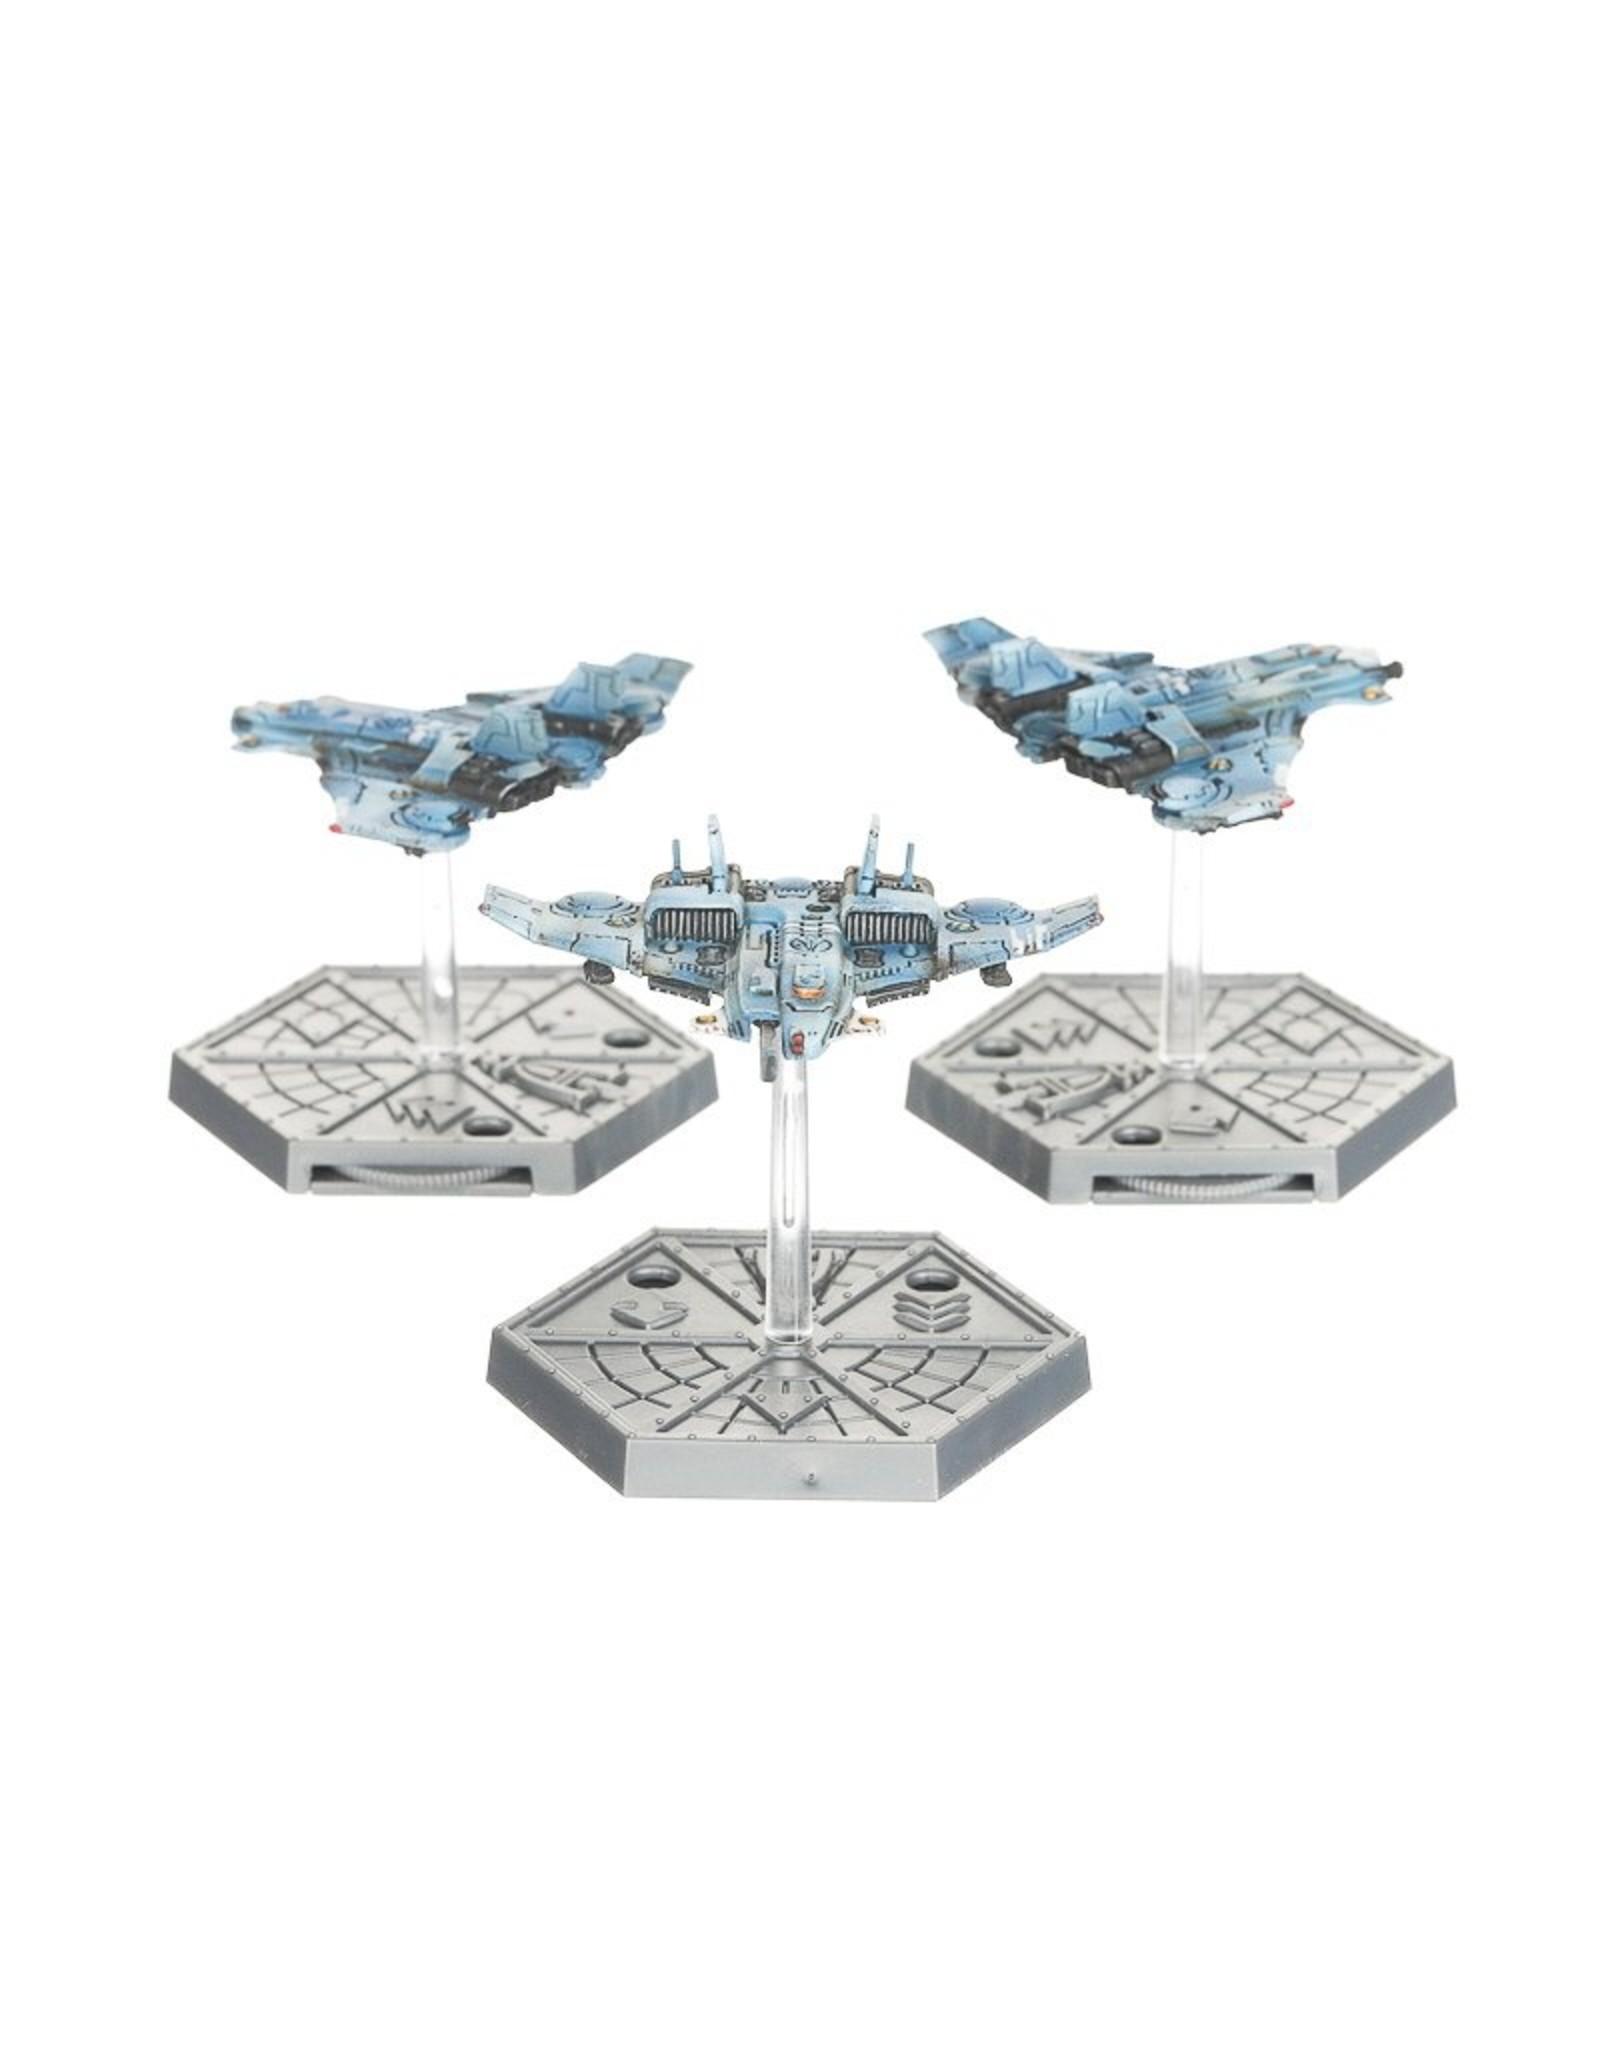 Games Workshop Aero/Imperialis: T'au Air Caste Barracuda Fighters